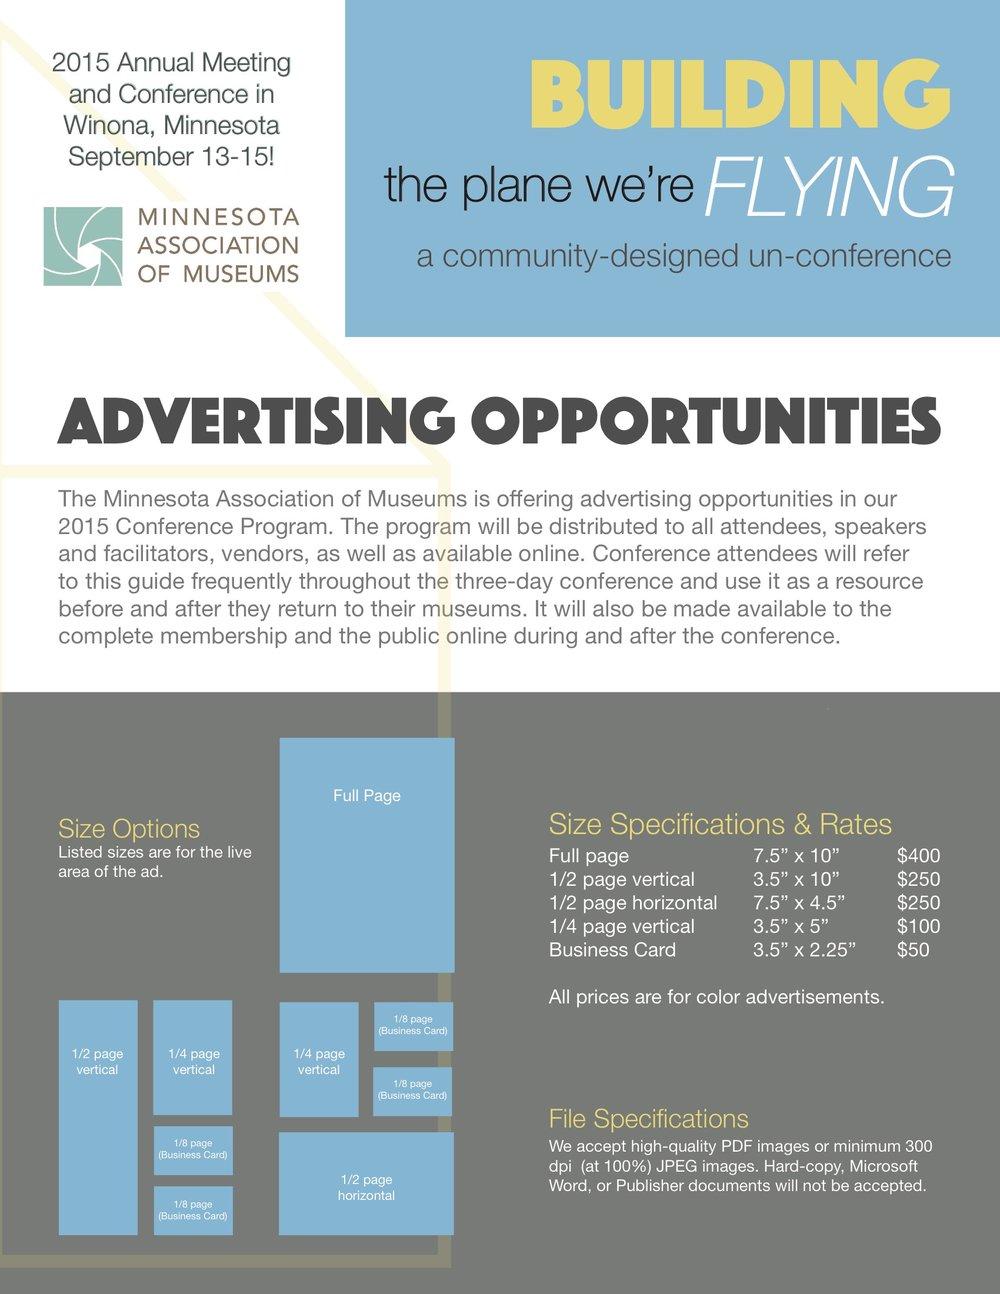 2015 MAM Ad & Sponsorship Opportunities 3.jpeg